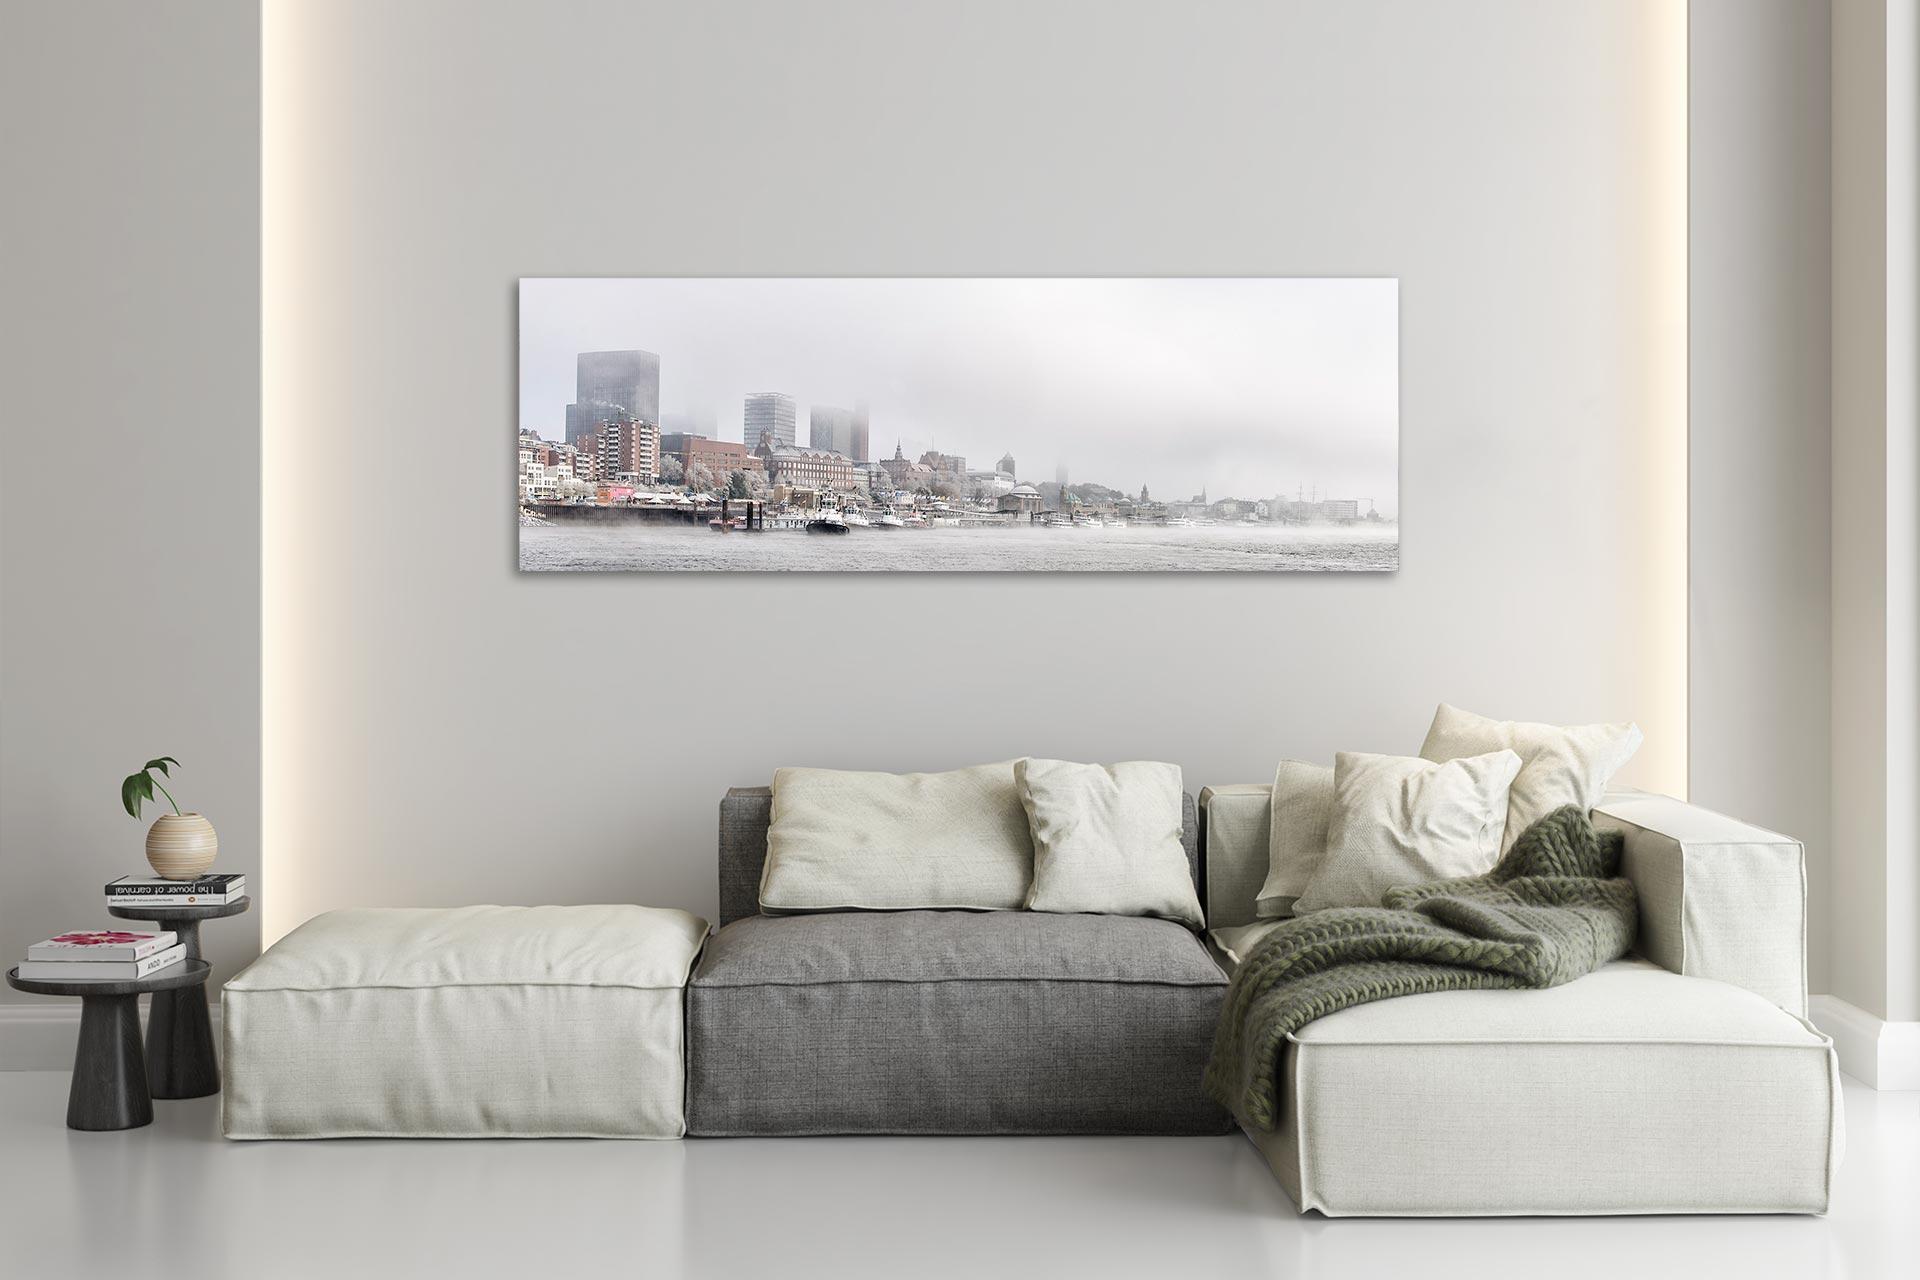 PSW102-panorama-hafen-leinwand-acrylglas-aludibond-wohnzimmer